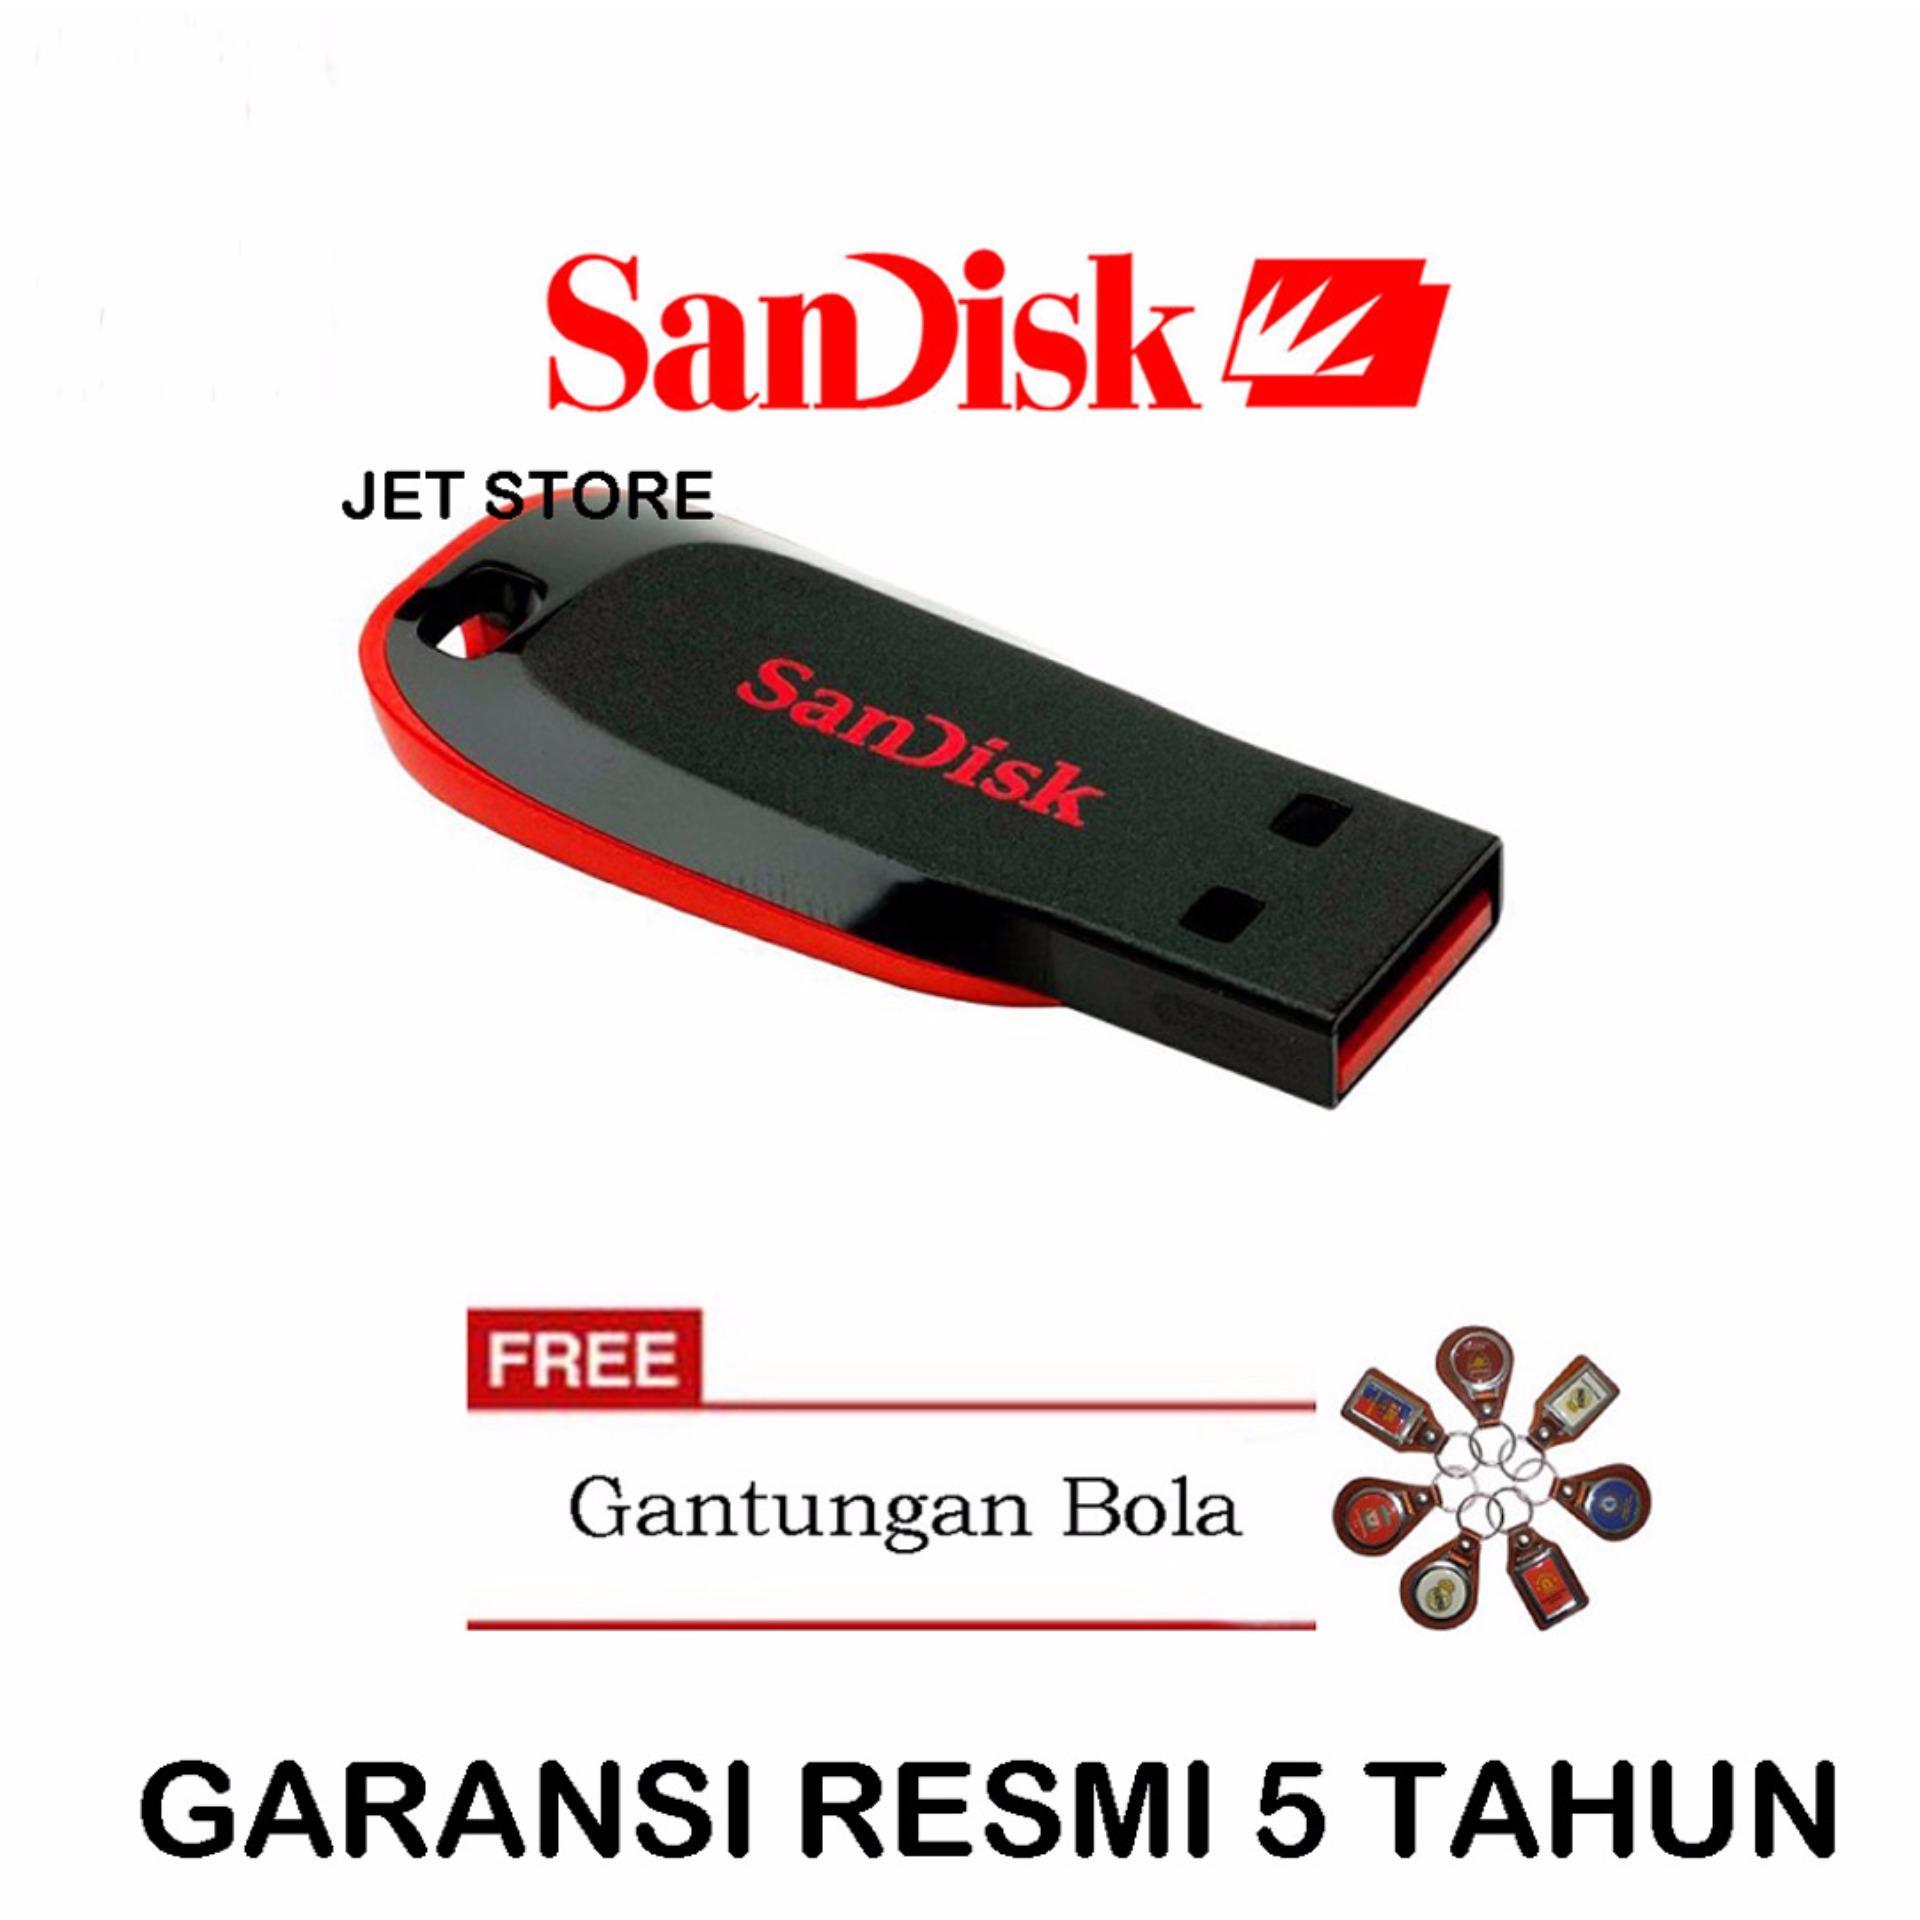 ... Sandisk Flash Disk USB 8GB Cruzer Blade CZ50 - Hitam + Gantungan Bola ...